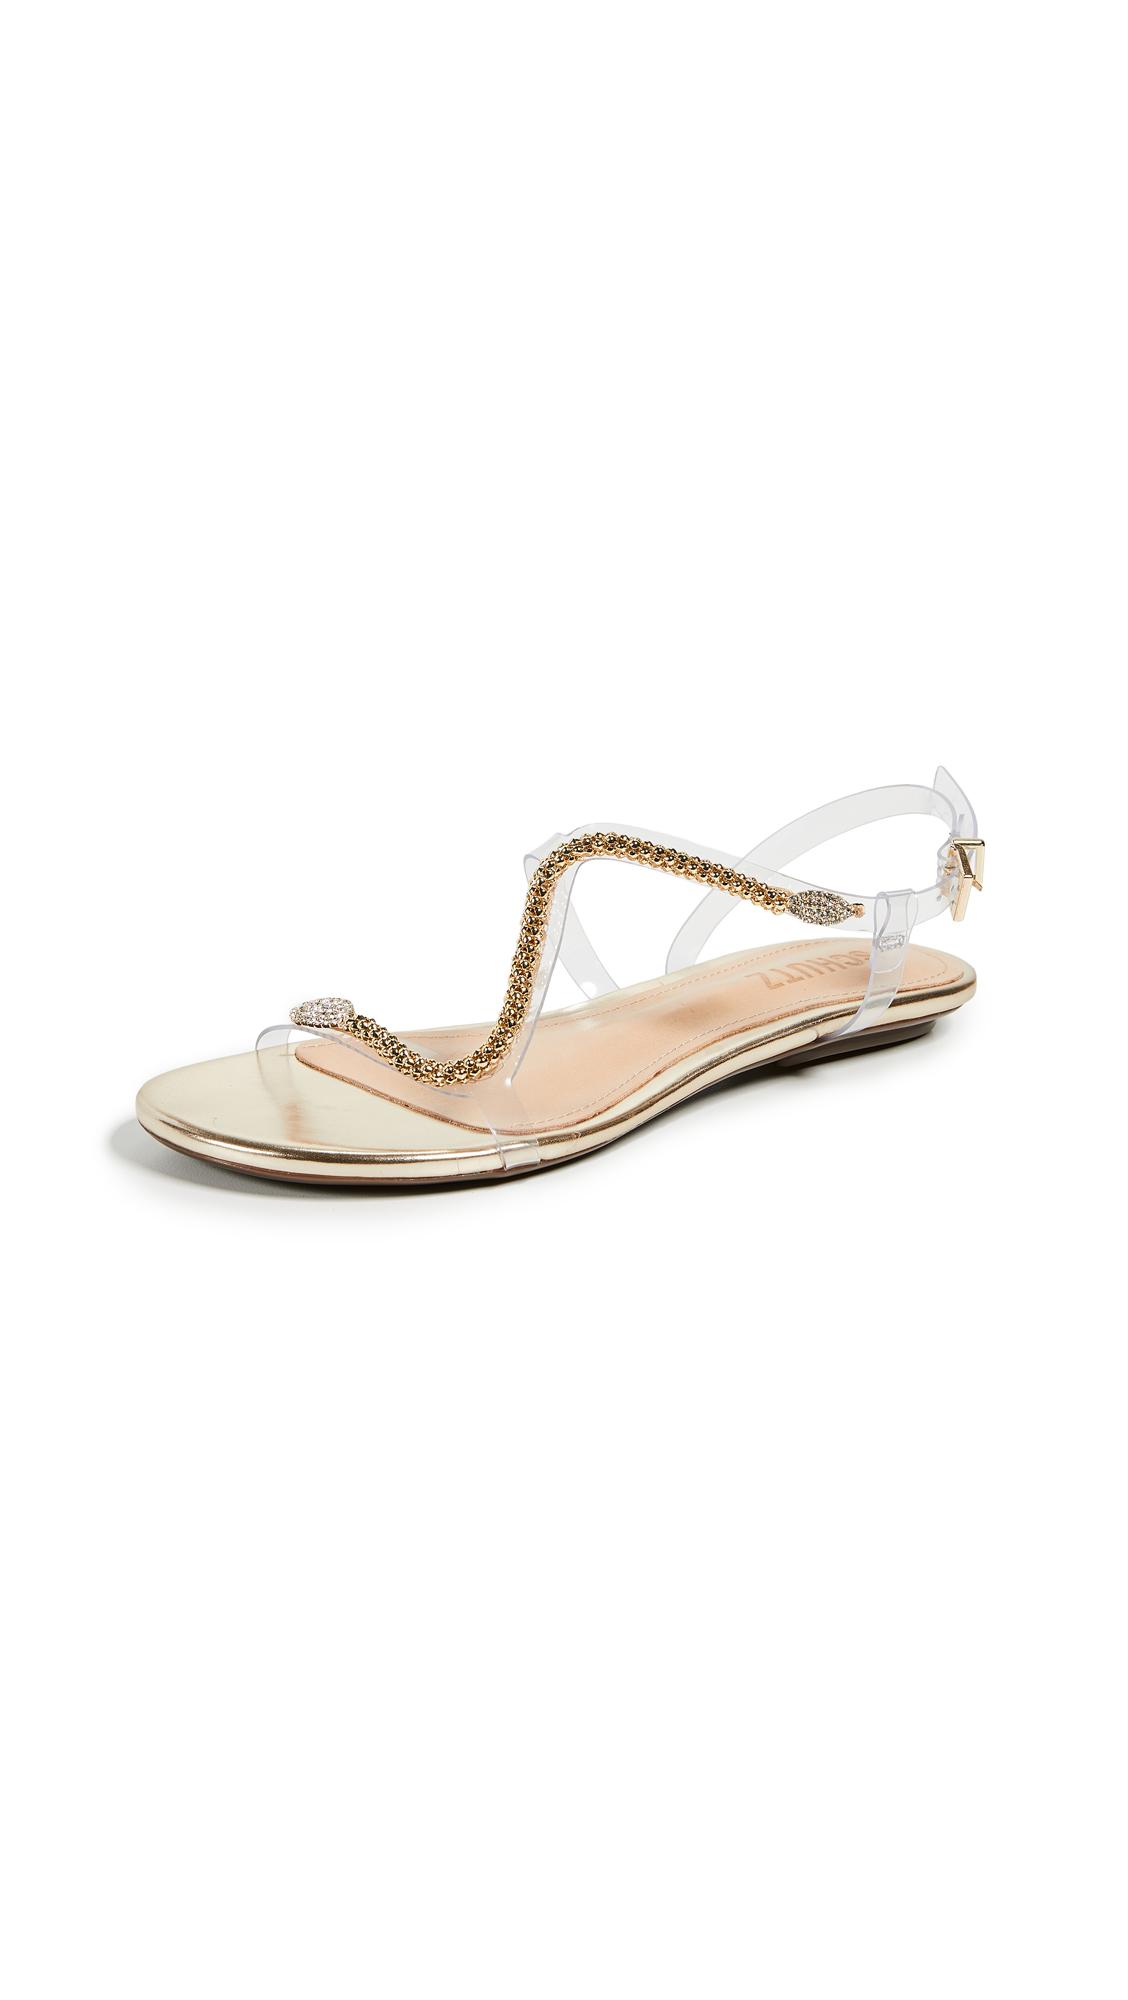 Schutz Gabby Vinyl Sandals - Transparent/Platina